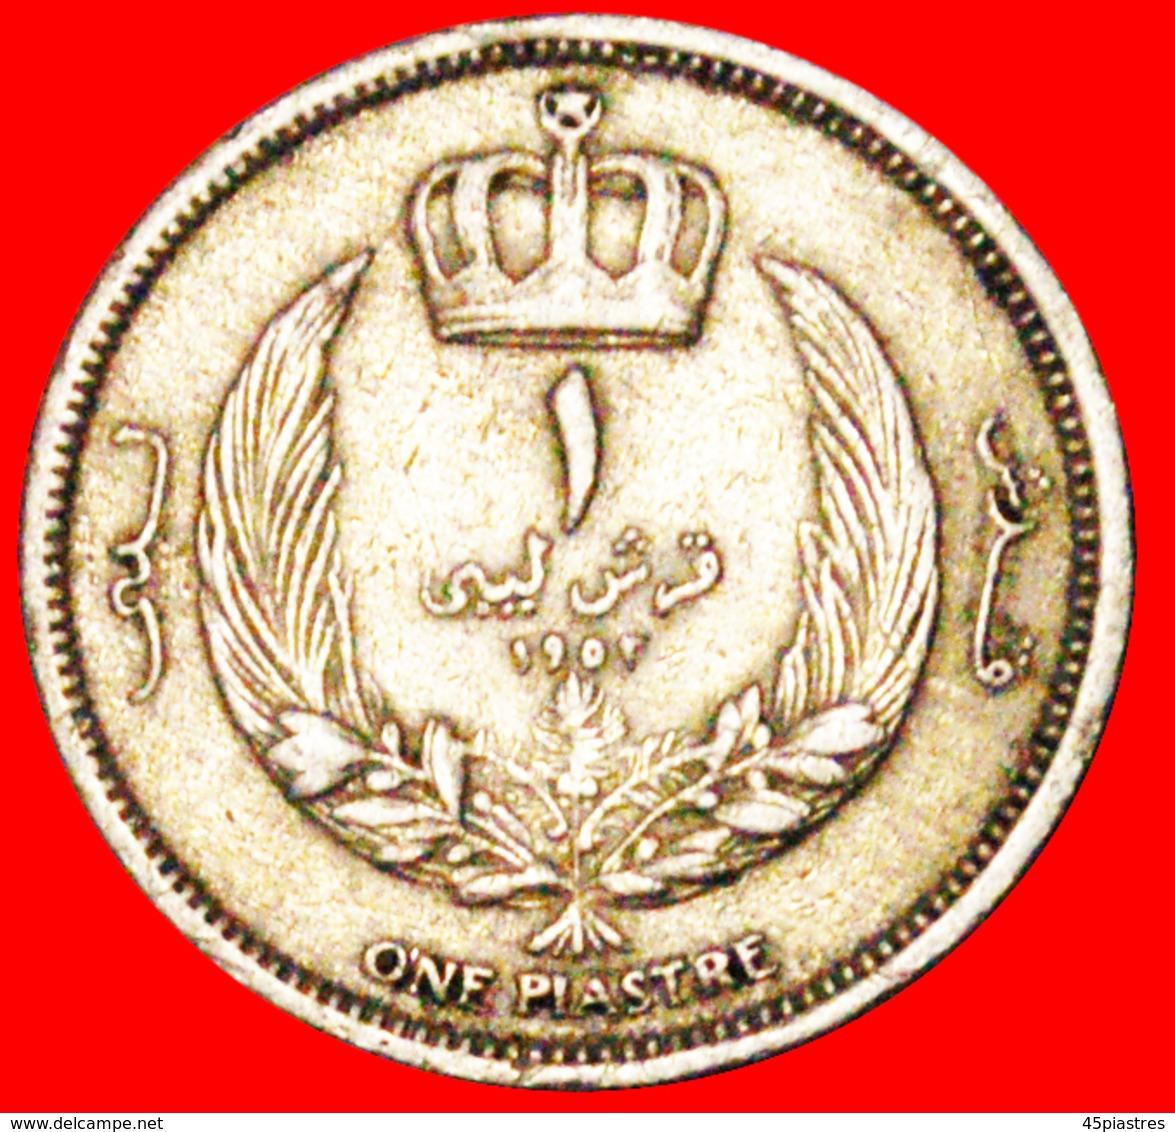 √ GREAT BRITAIN* KINGDOM LIBYA ★ 1 PIASTRE 1952! LOW START ★ NO RESERVE! - Libye